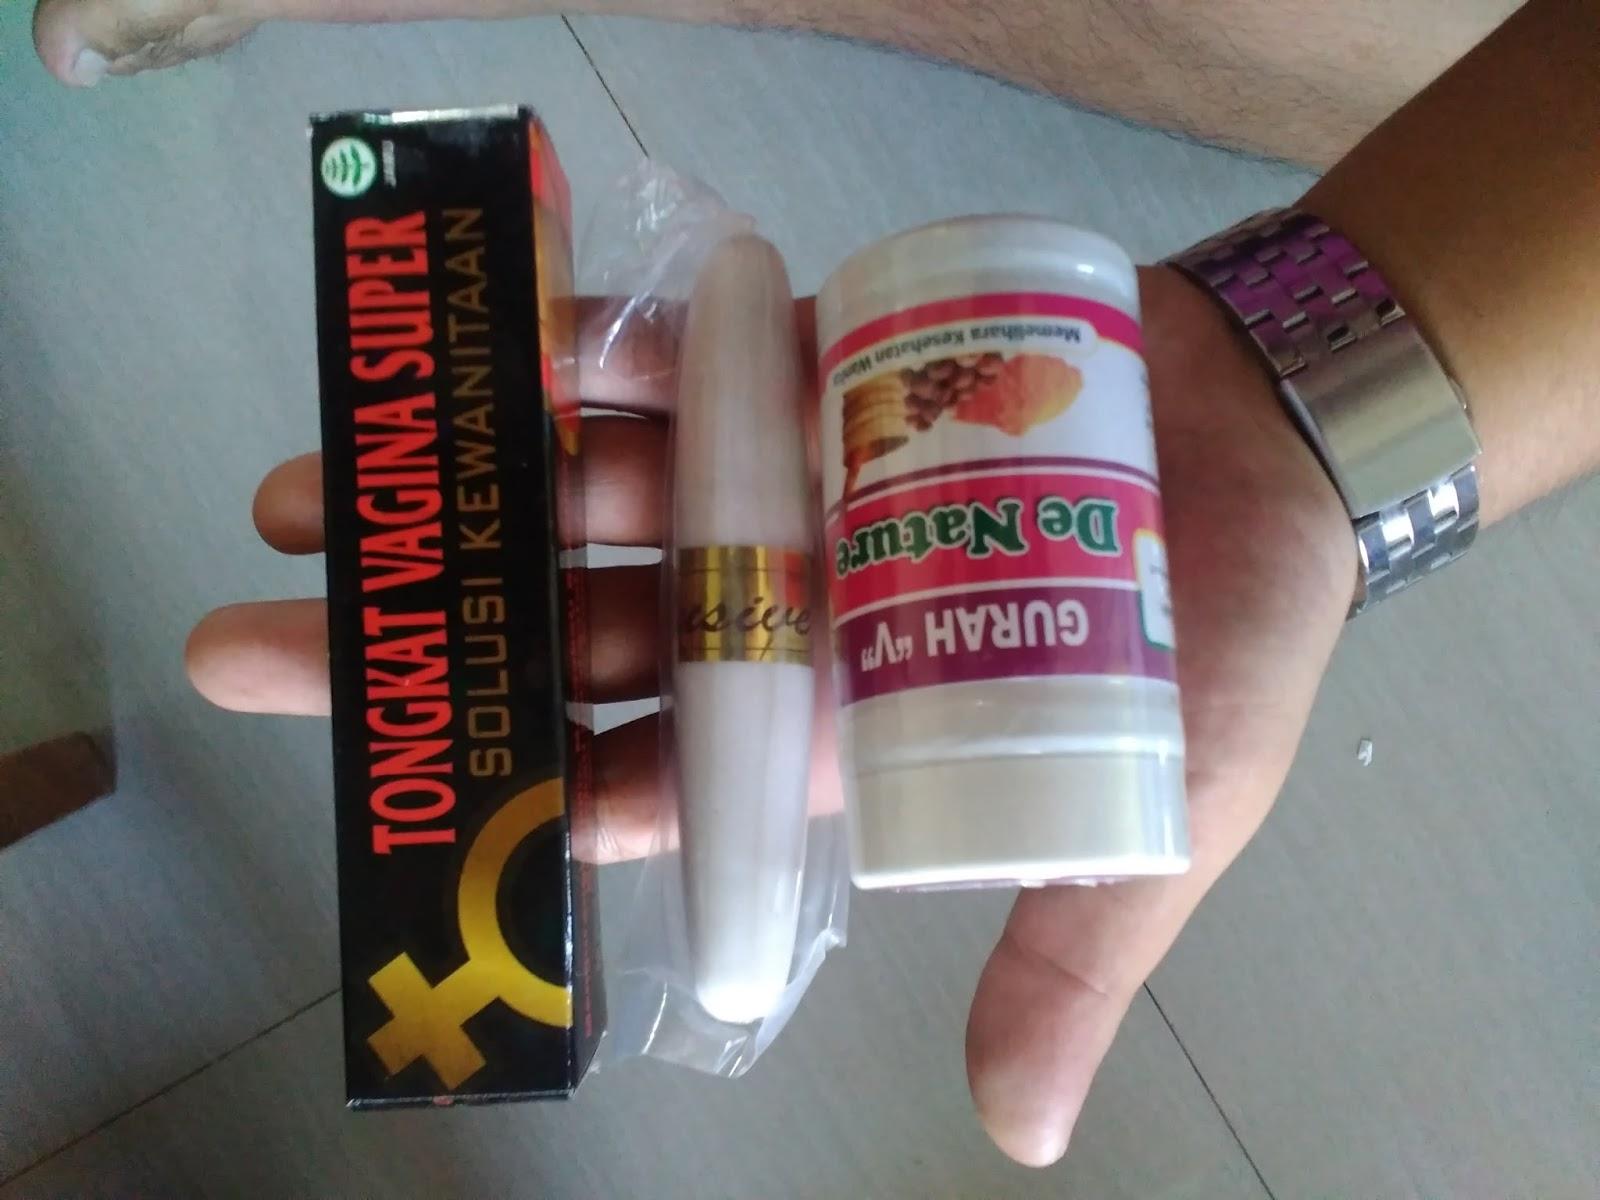 obat menghilangkan keputihan dan bau tak sedap